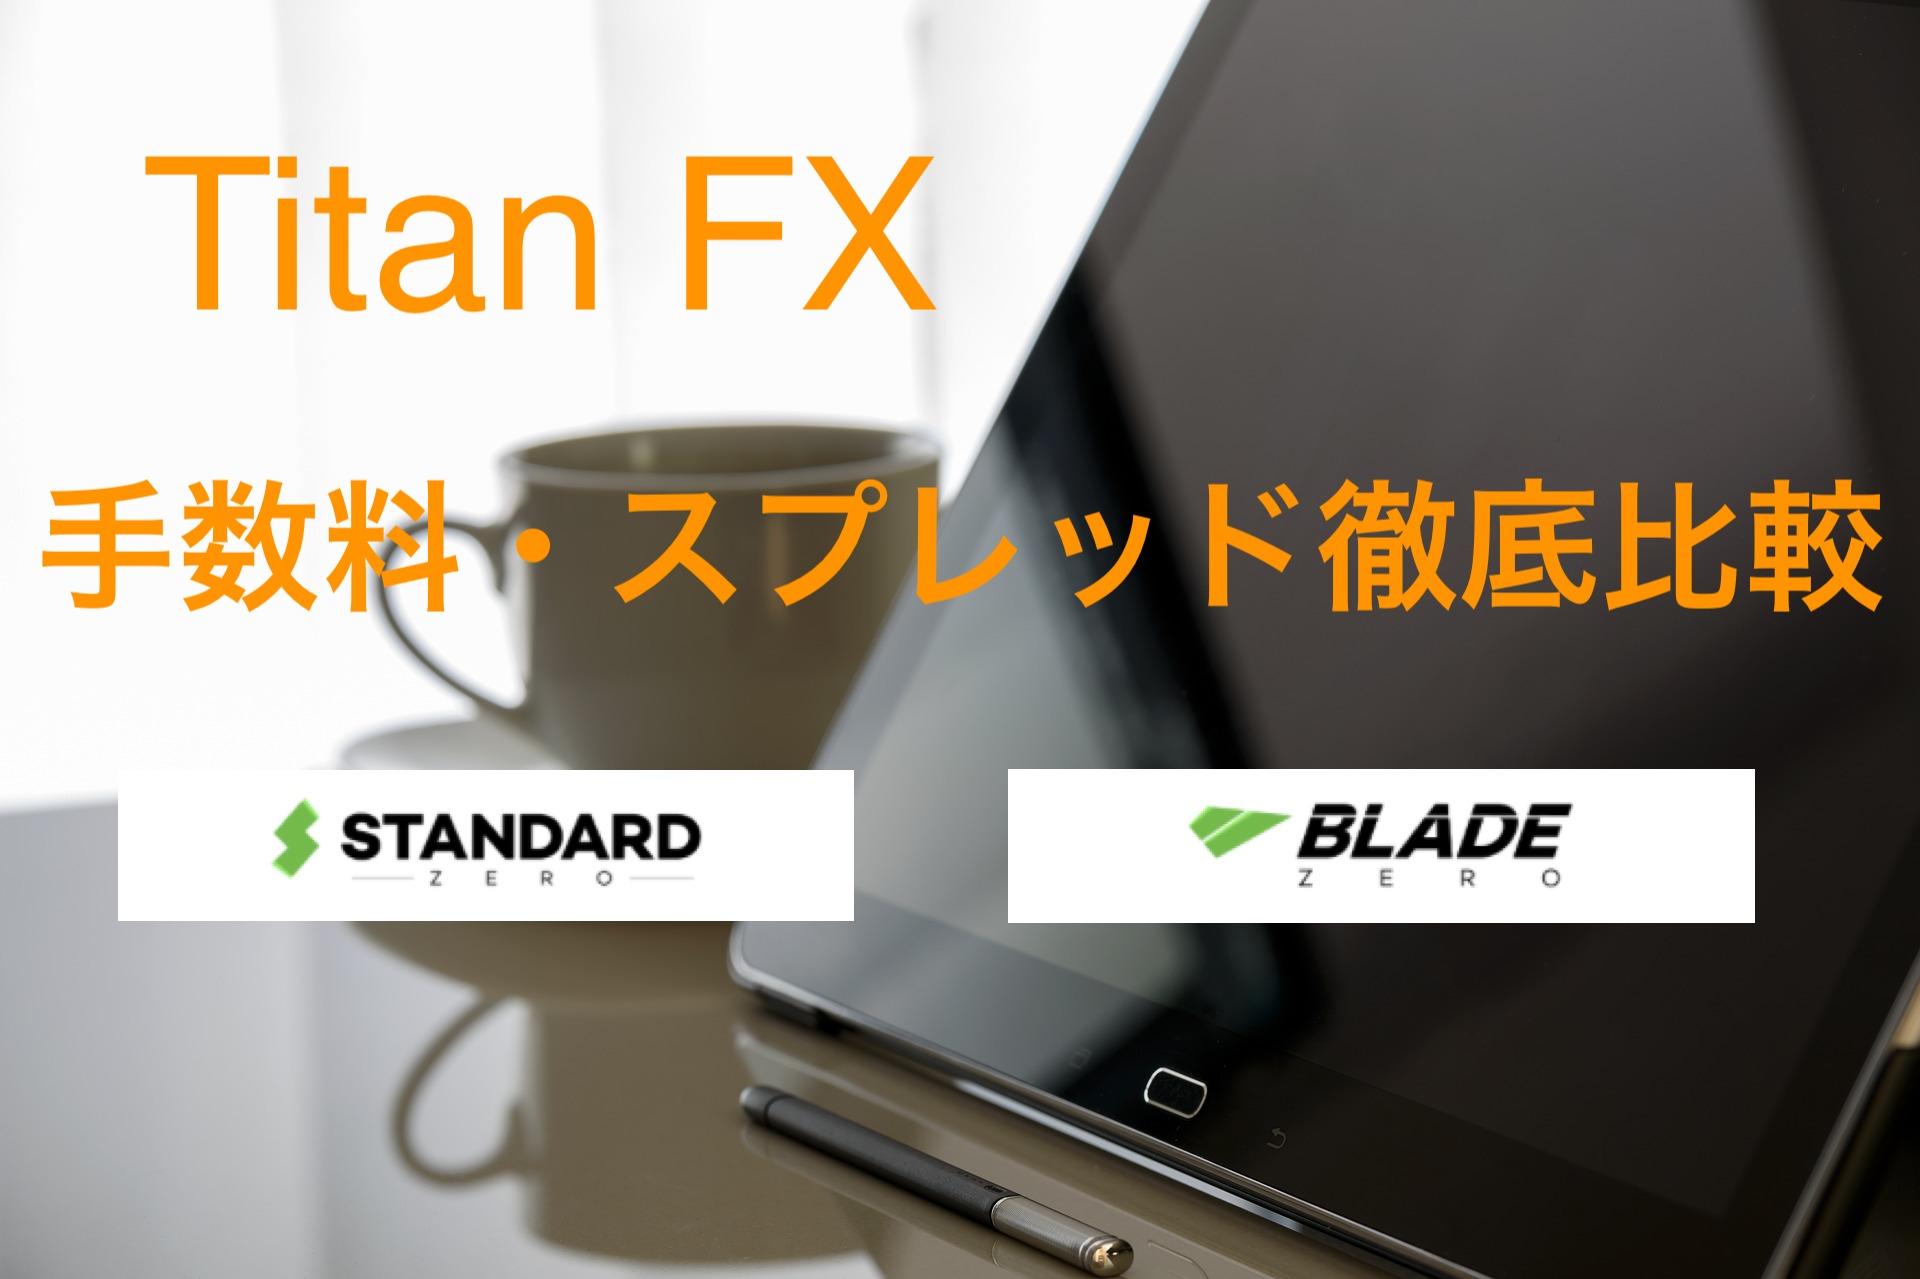 TitanFXのスタンダード口座vsブレード口座 どっちがオススメ?